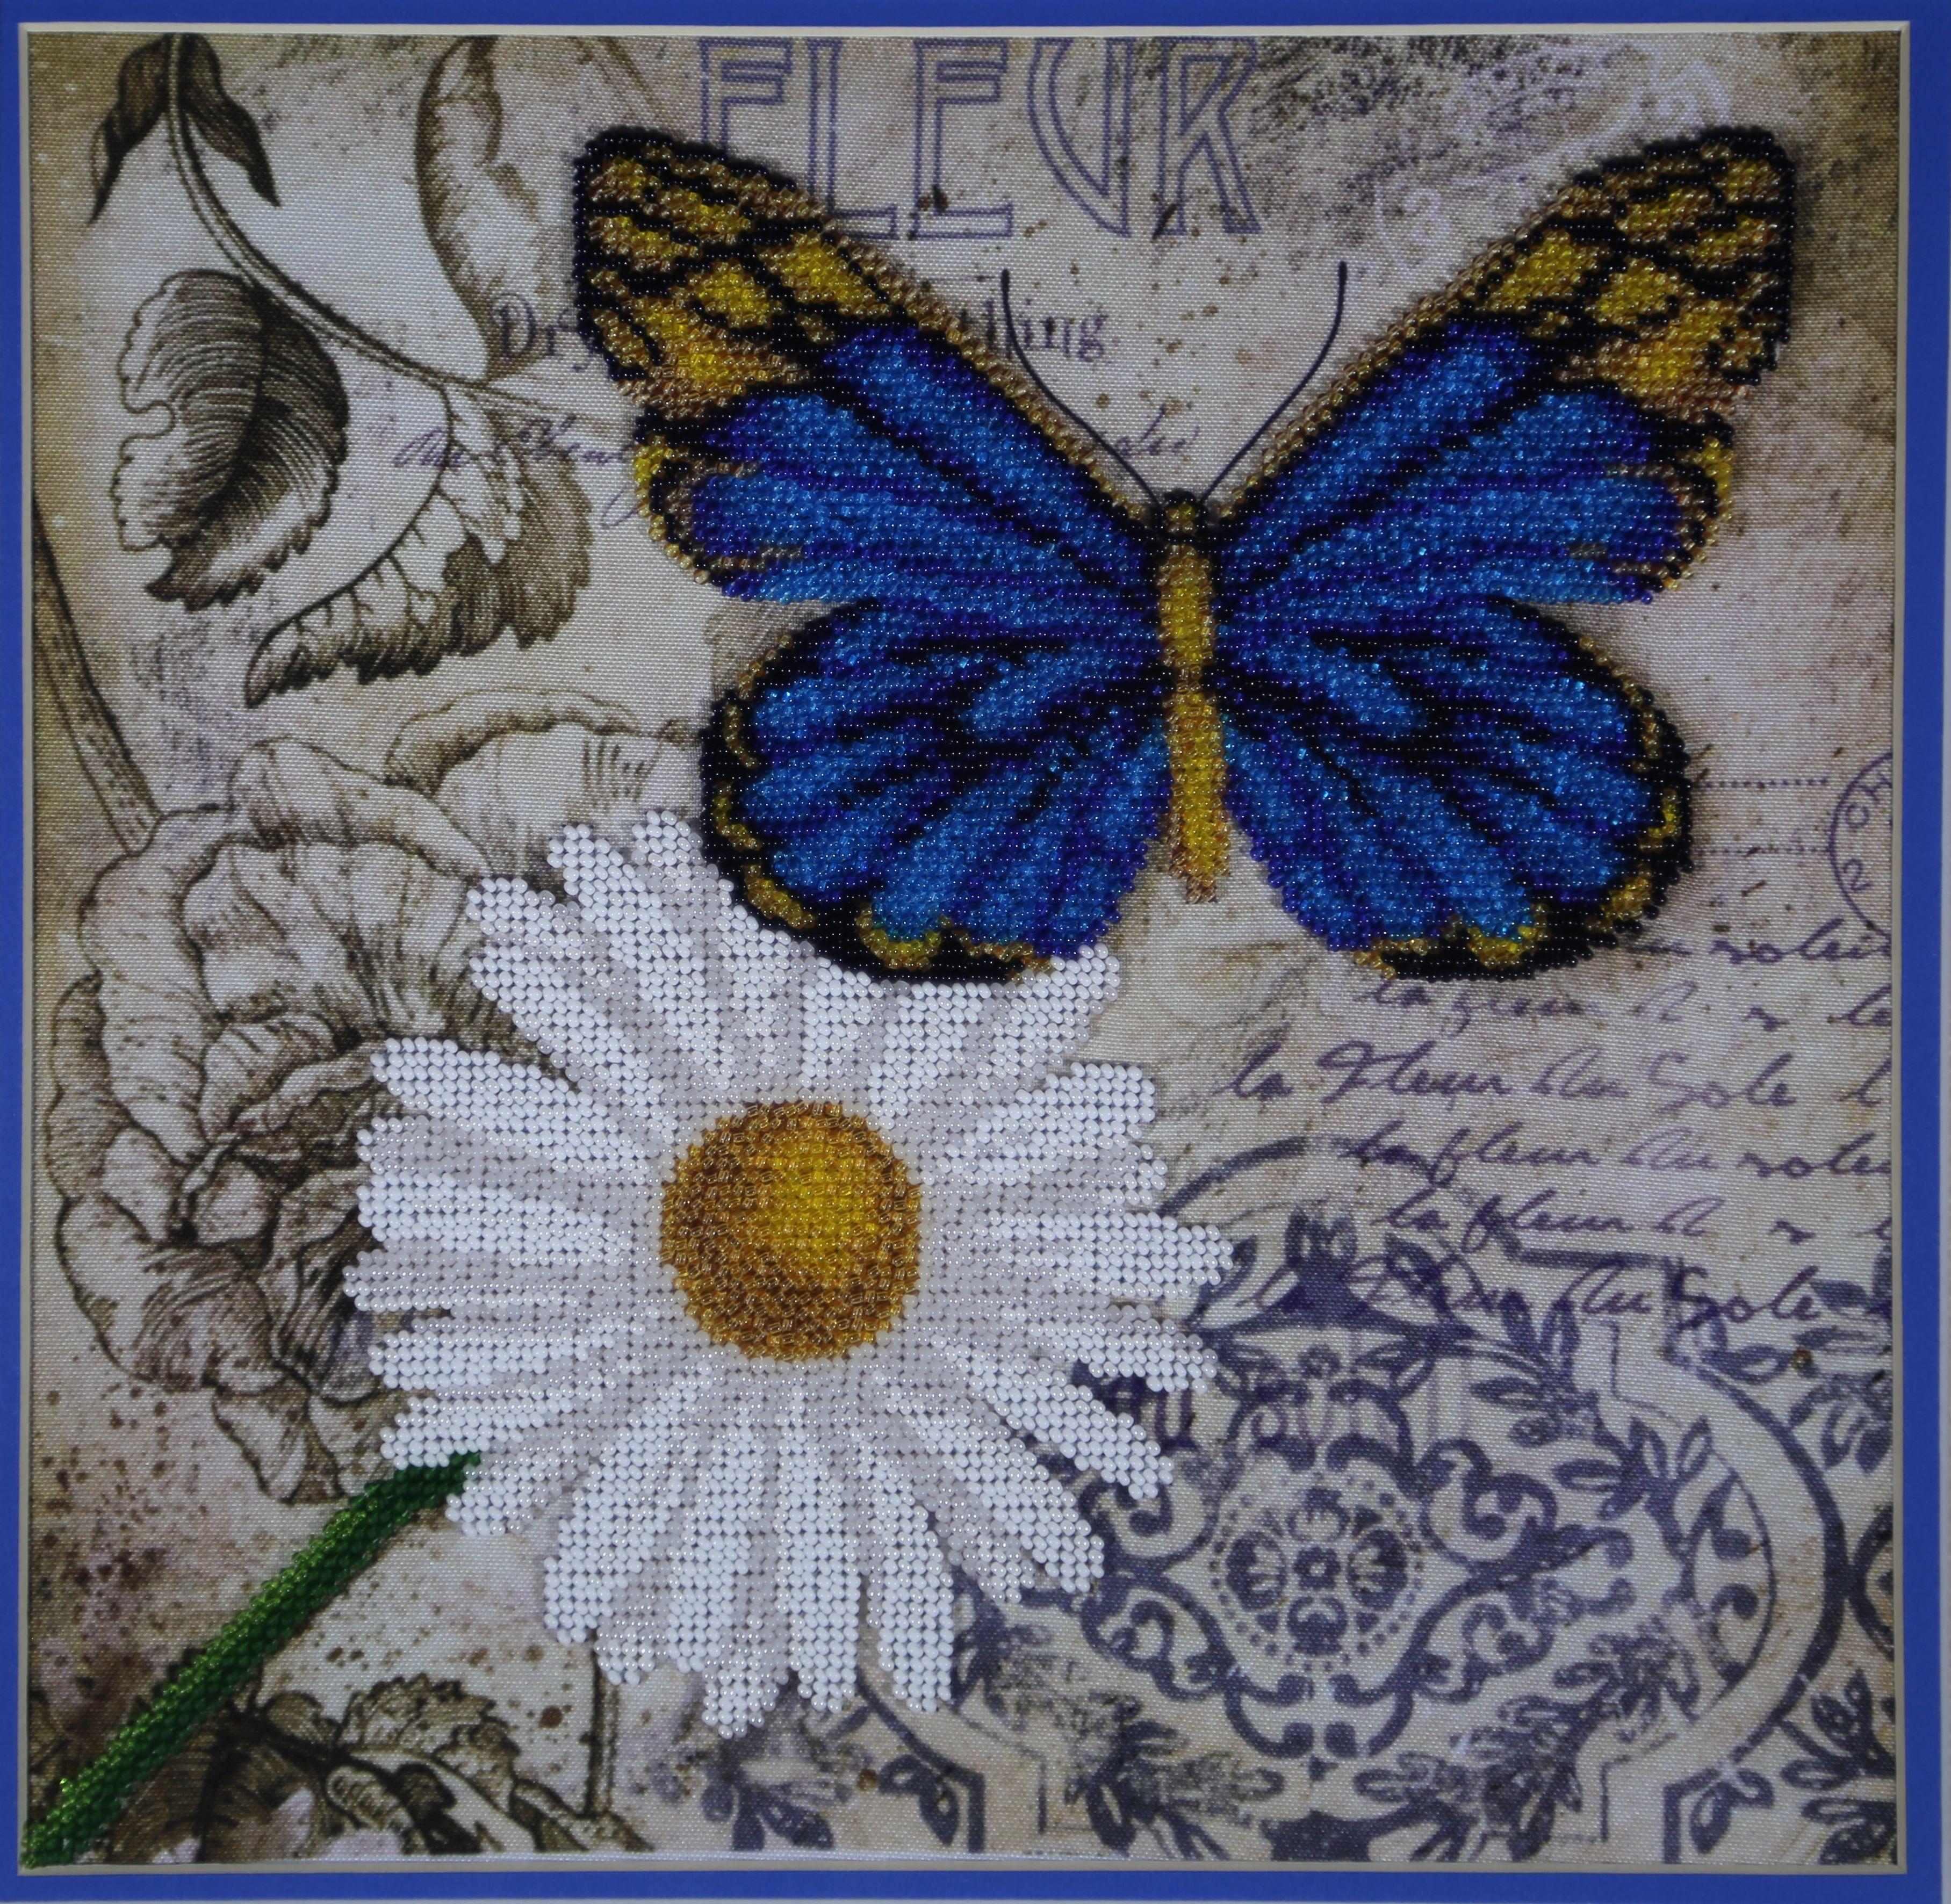 бисеромвышивкавышивка бисеромбабочкасиняя бабочкаромашкаручная работаготовая работаоберег картинакартина